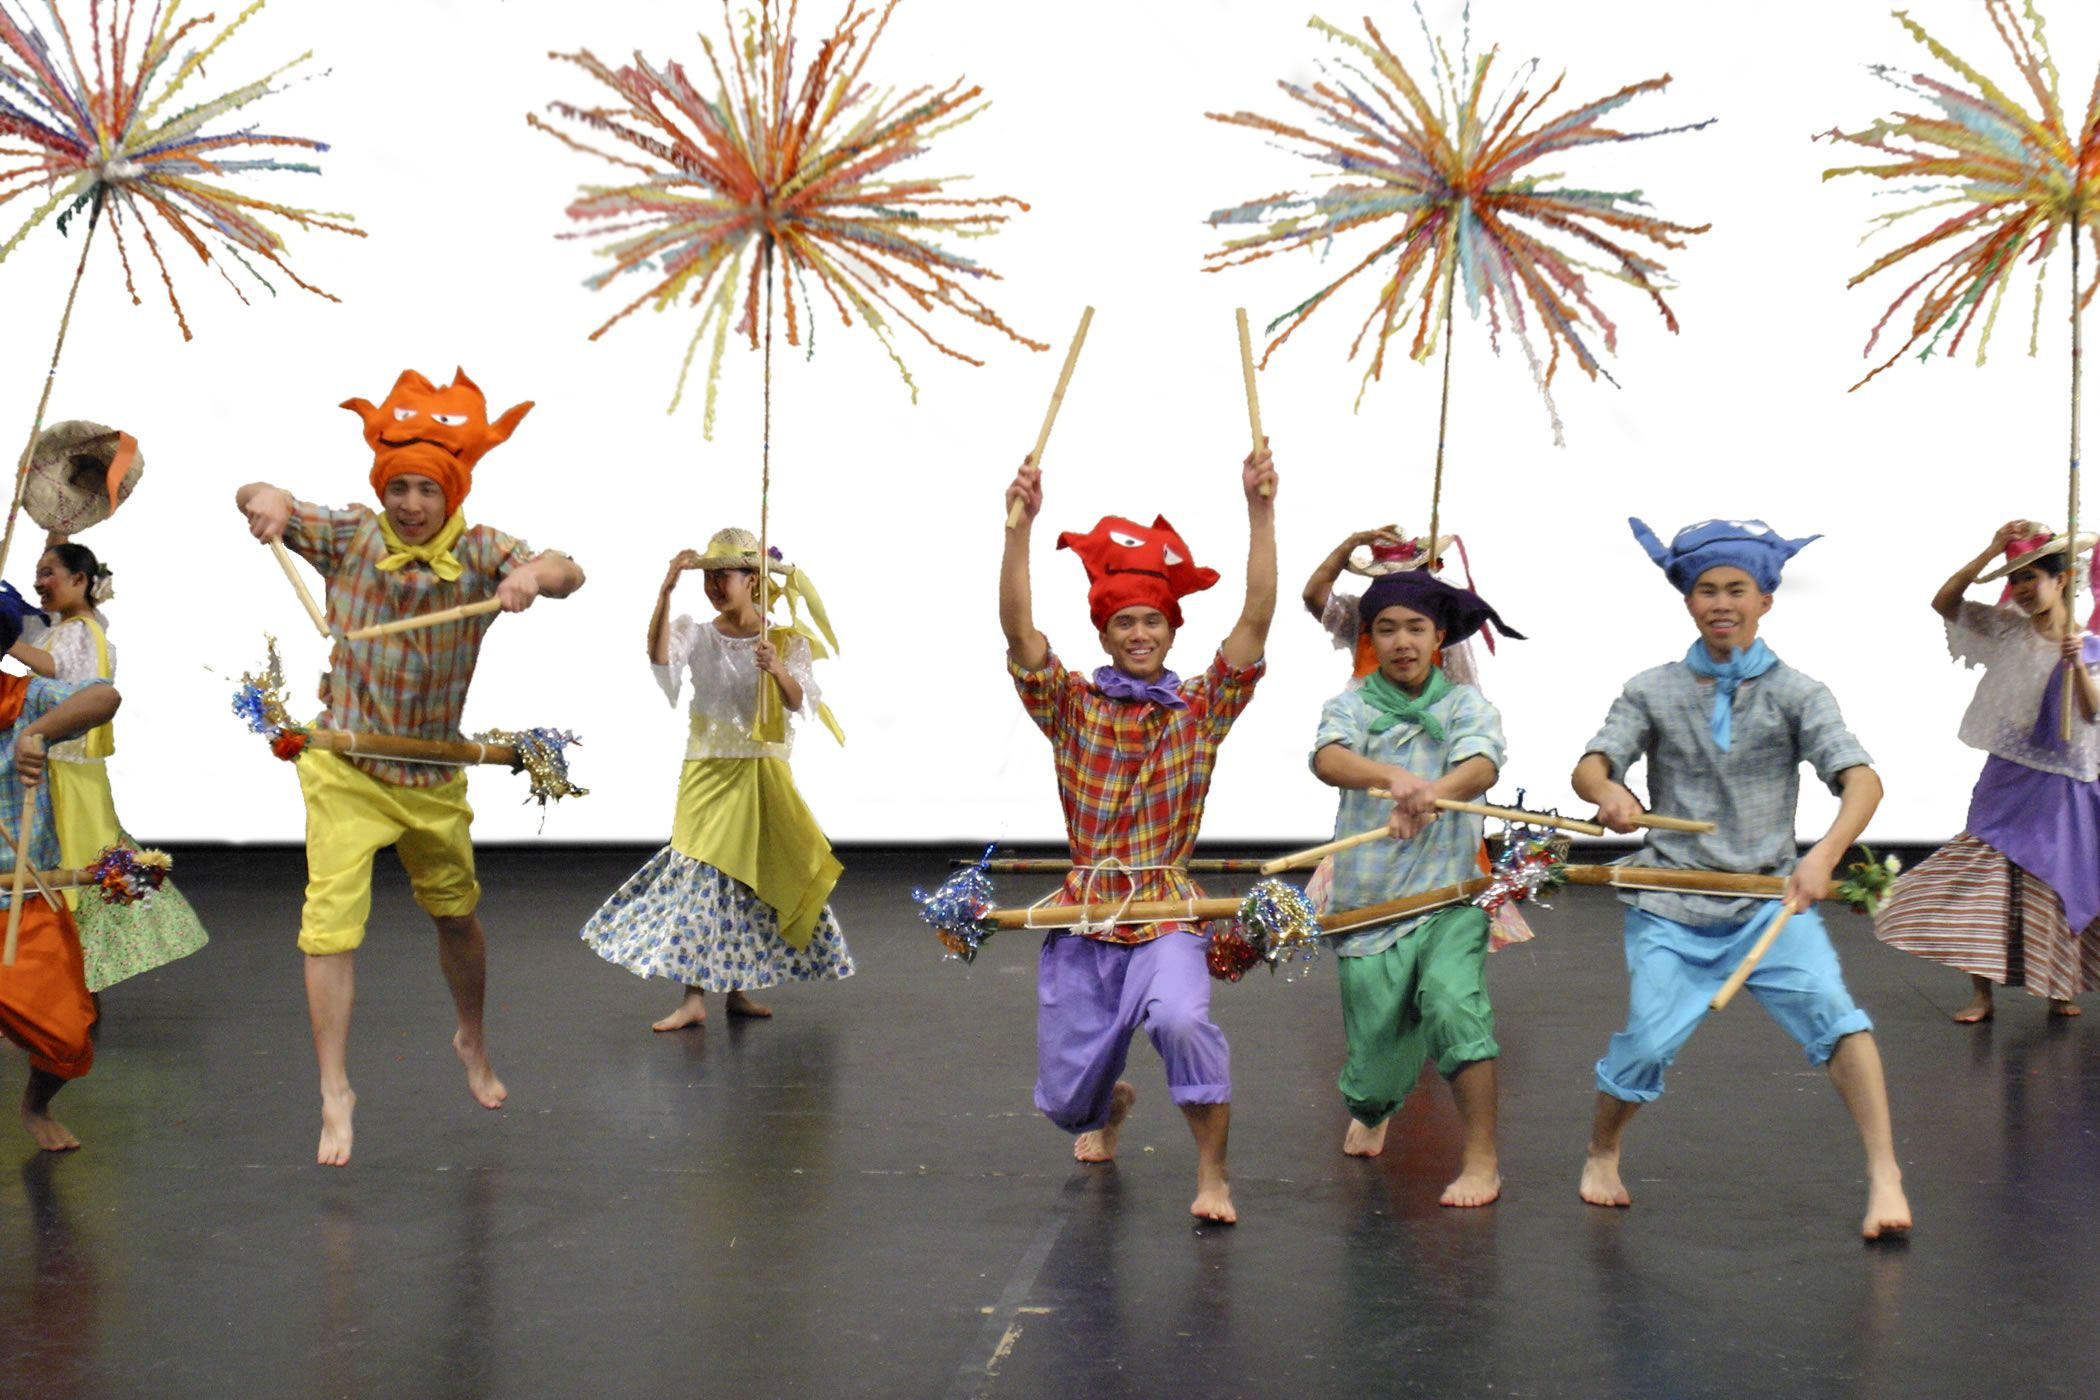 Parangal dance company philippine folk dance - Hiyas Philippine Folk Dance Company